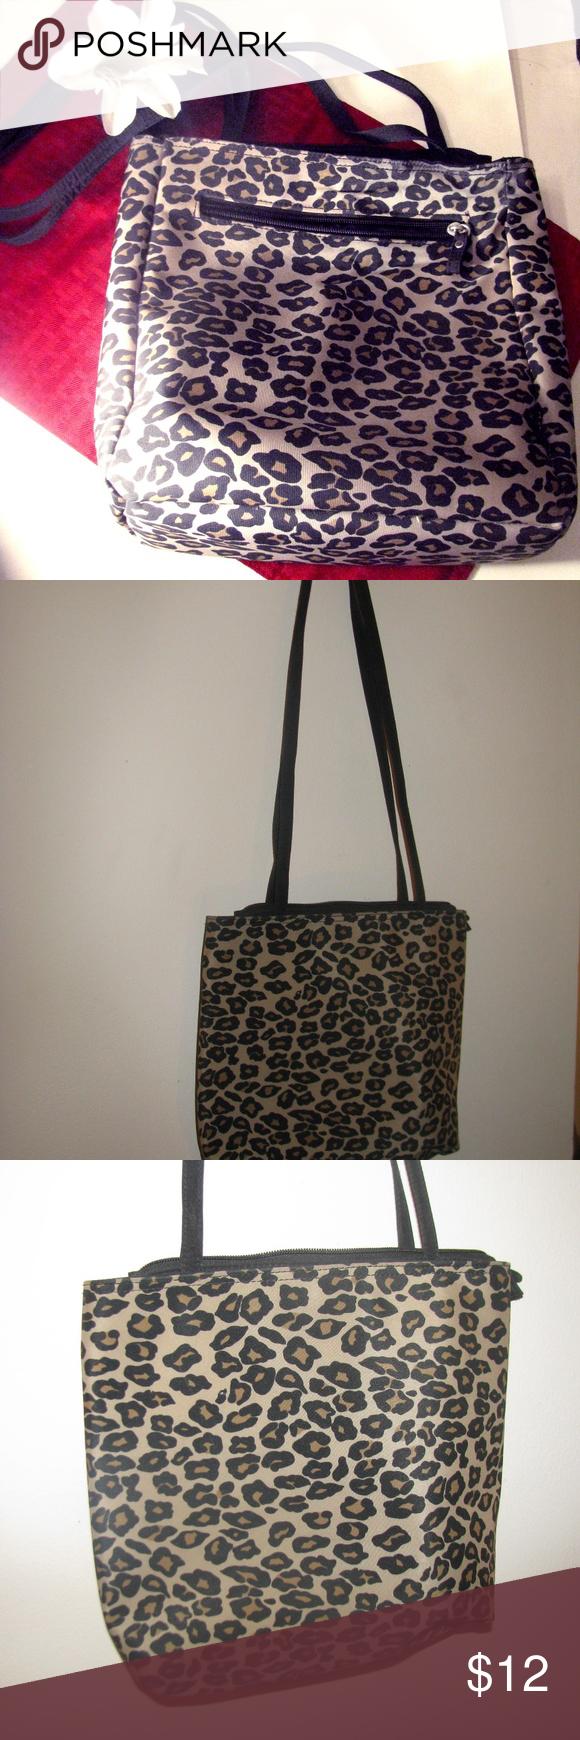 a6b143971f5 KMQ Collection Cheetah Handbag Cheetah print Two zipper compartments, one  zipper compartment inside , One Outside 10 by 11 strap length 16inches KMQ  Bags ...